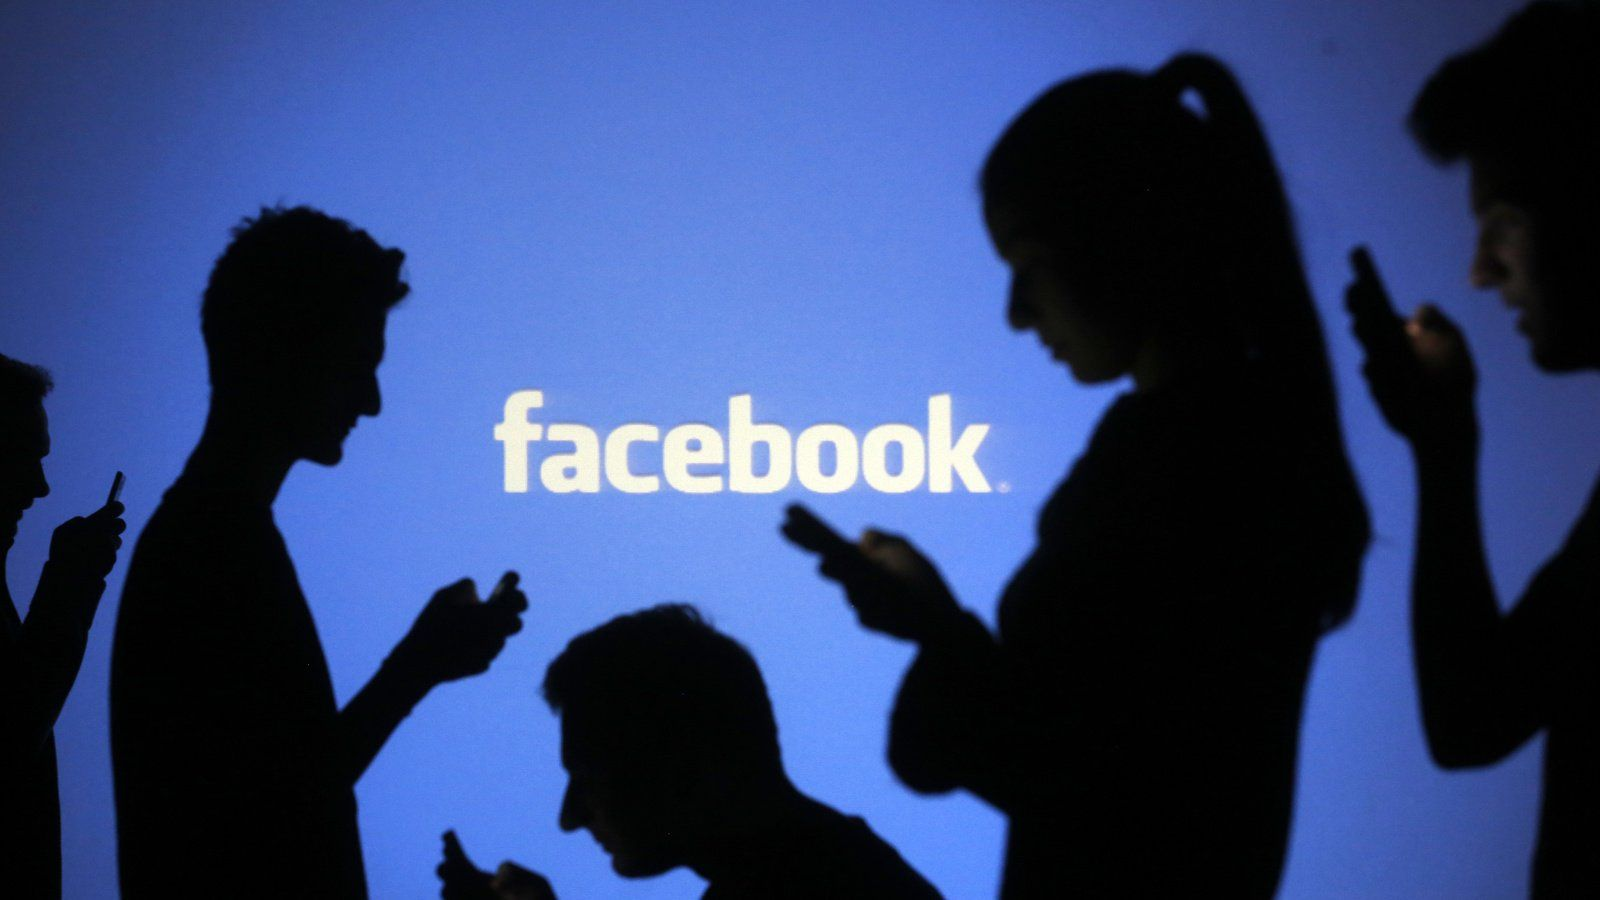 Advertisers threaten to stop advertising on Facebook